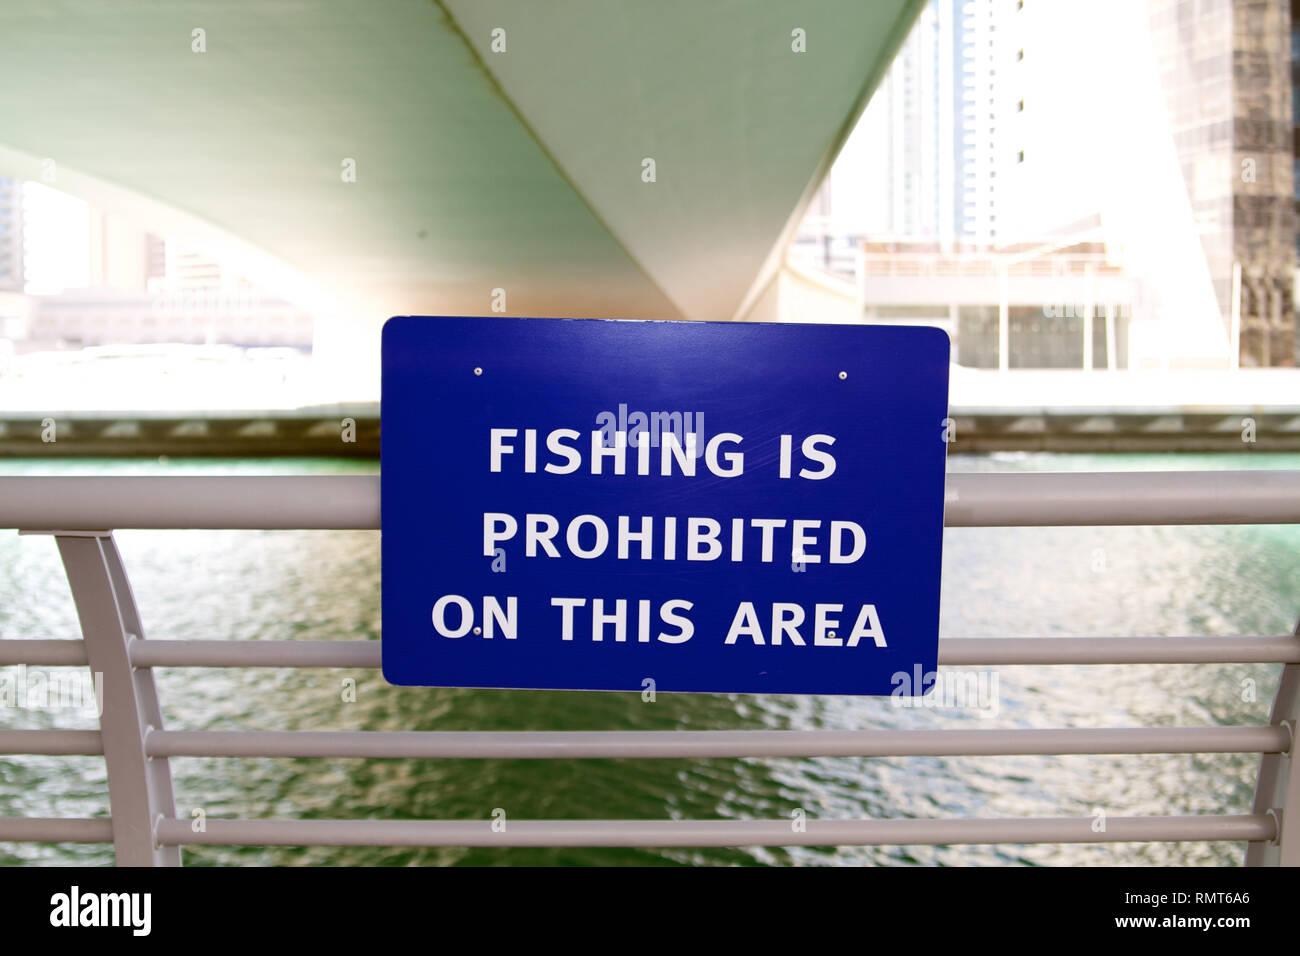 Dubai-Fishing is prohibited on this area blue warning plate at Marina walk - Stock Image